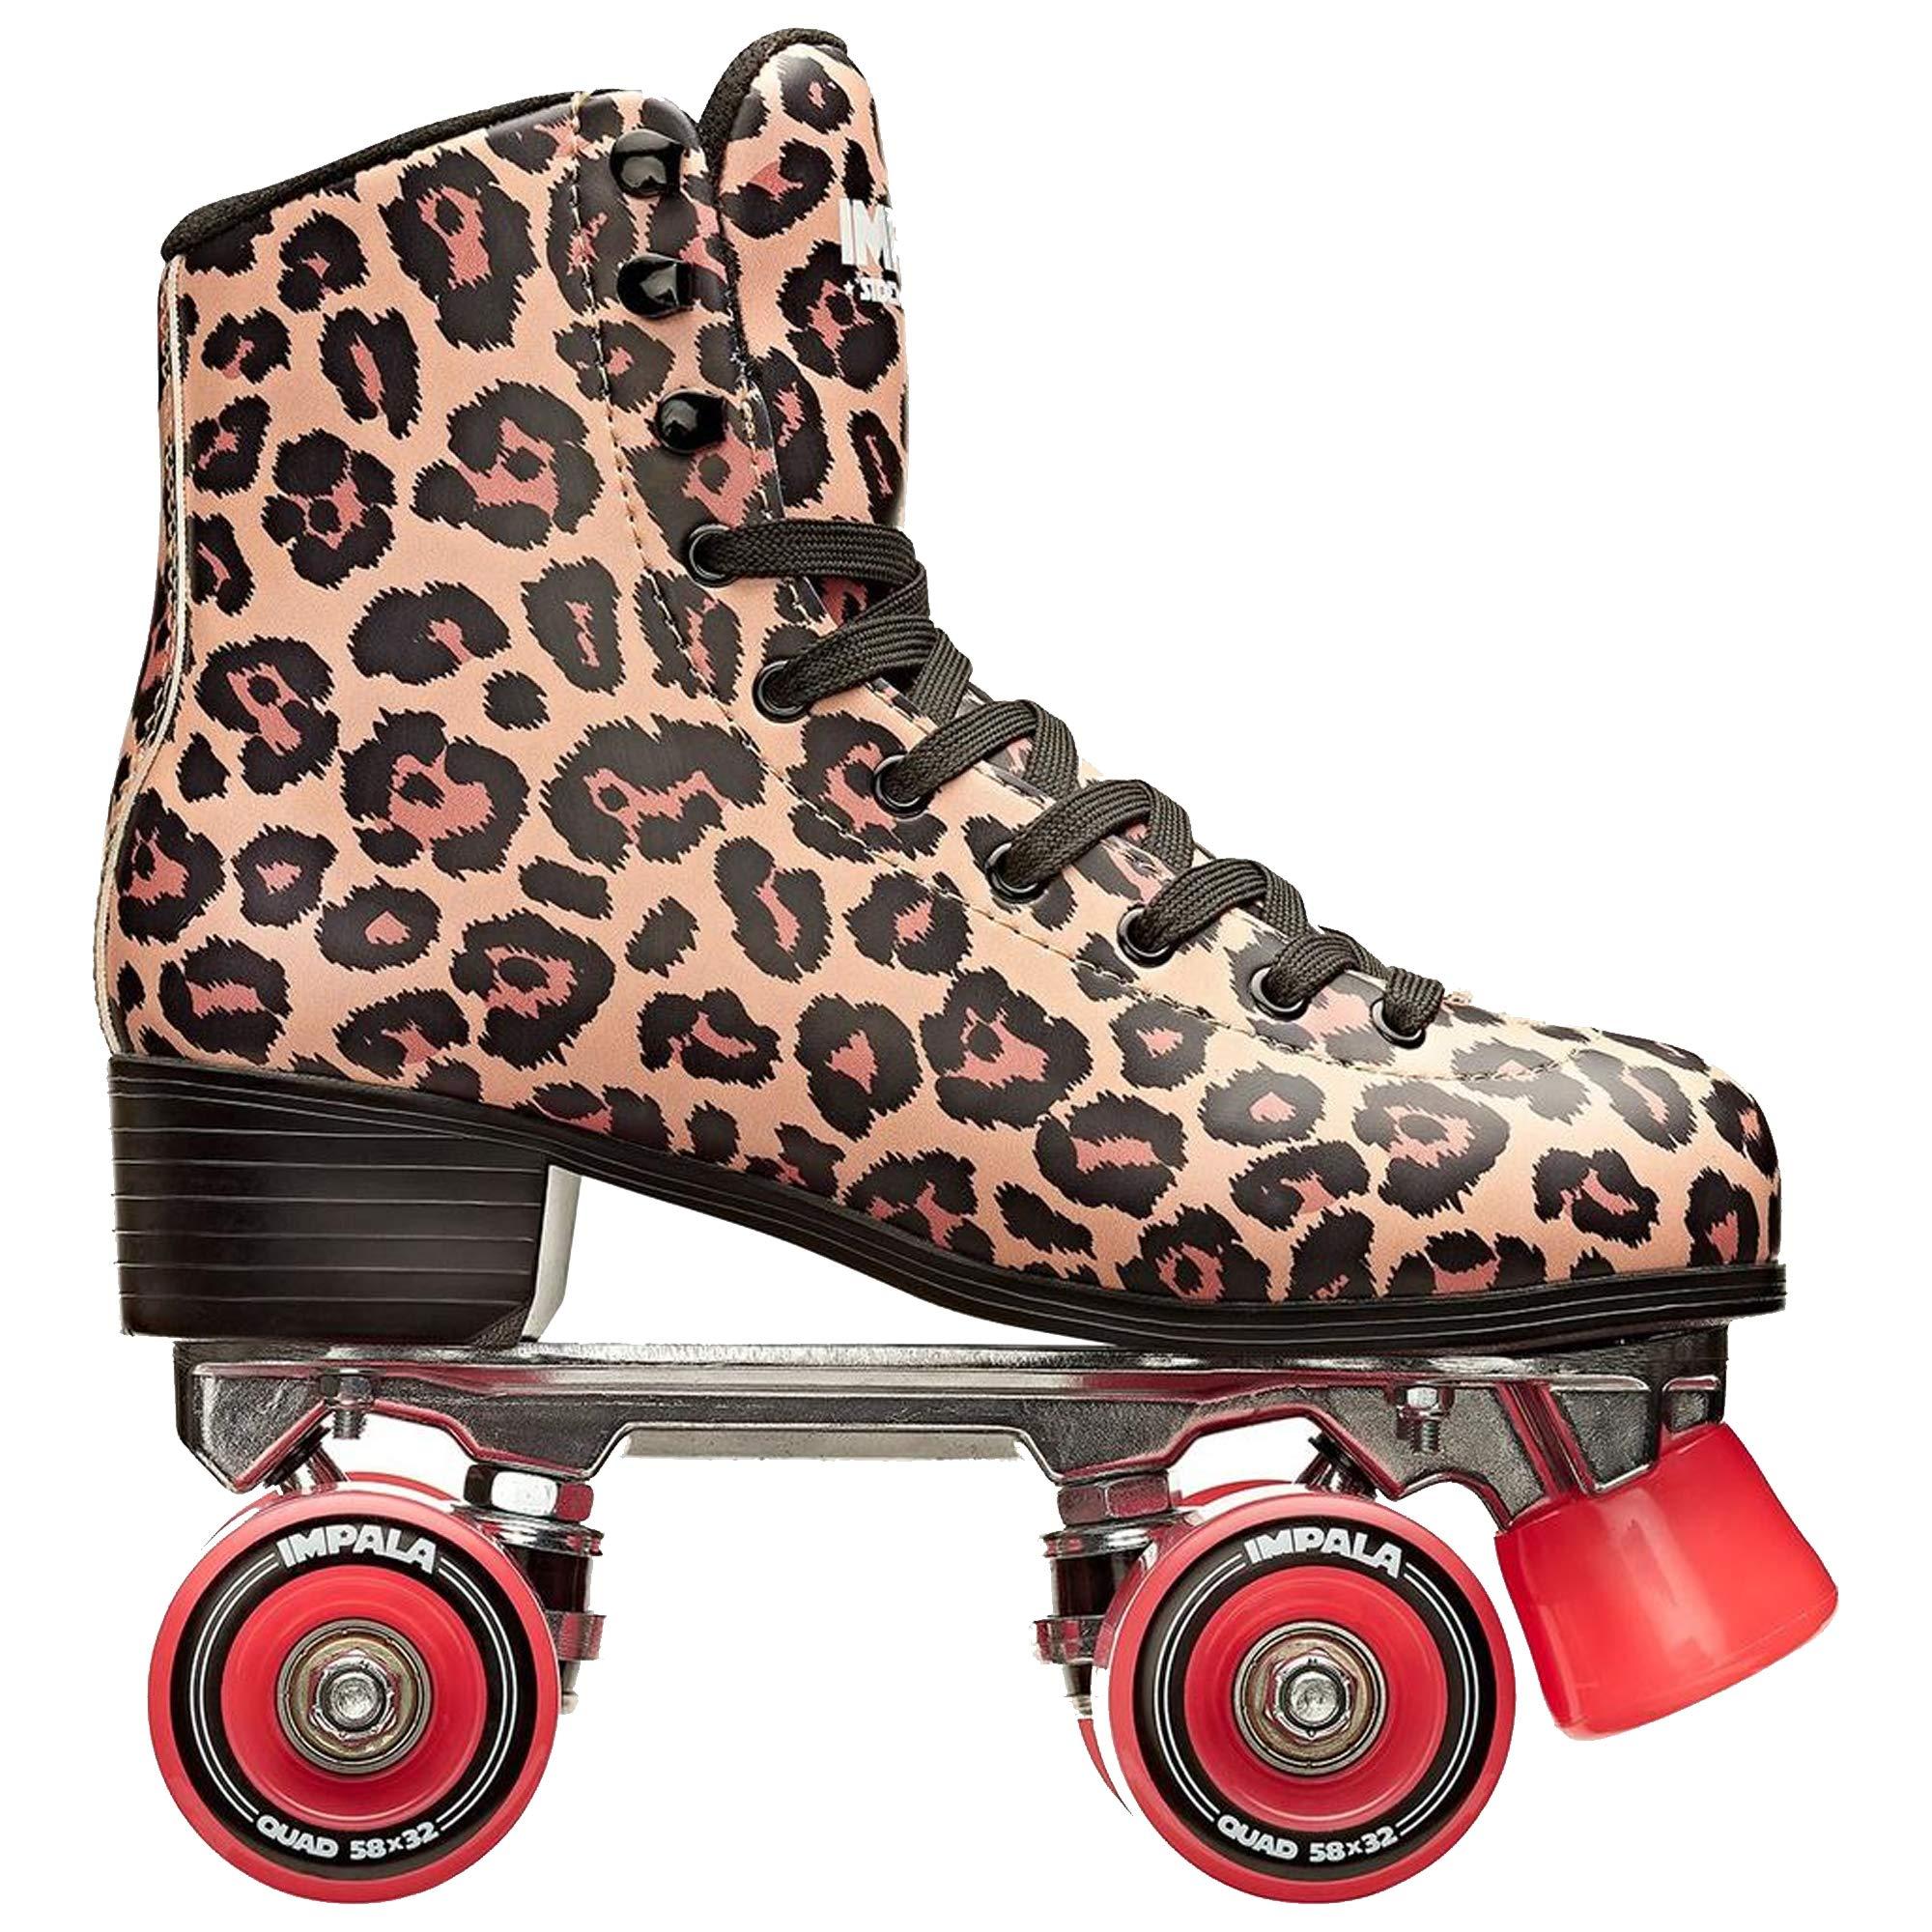 Impala Rollerskates Girl's Impala Quad Skate (Big Kid/Adult) Leopard 9 M